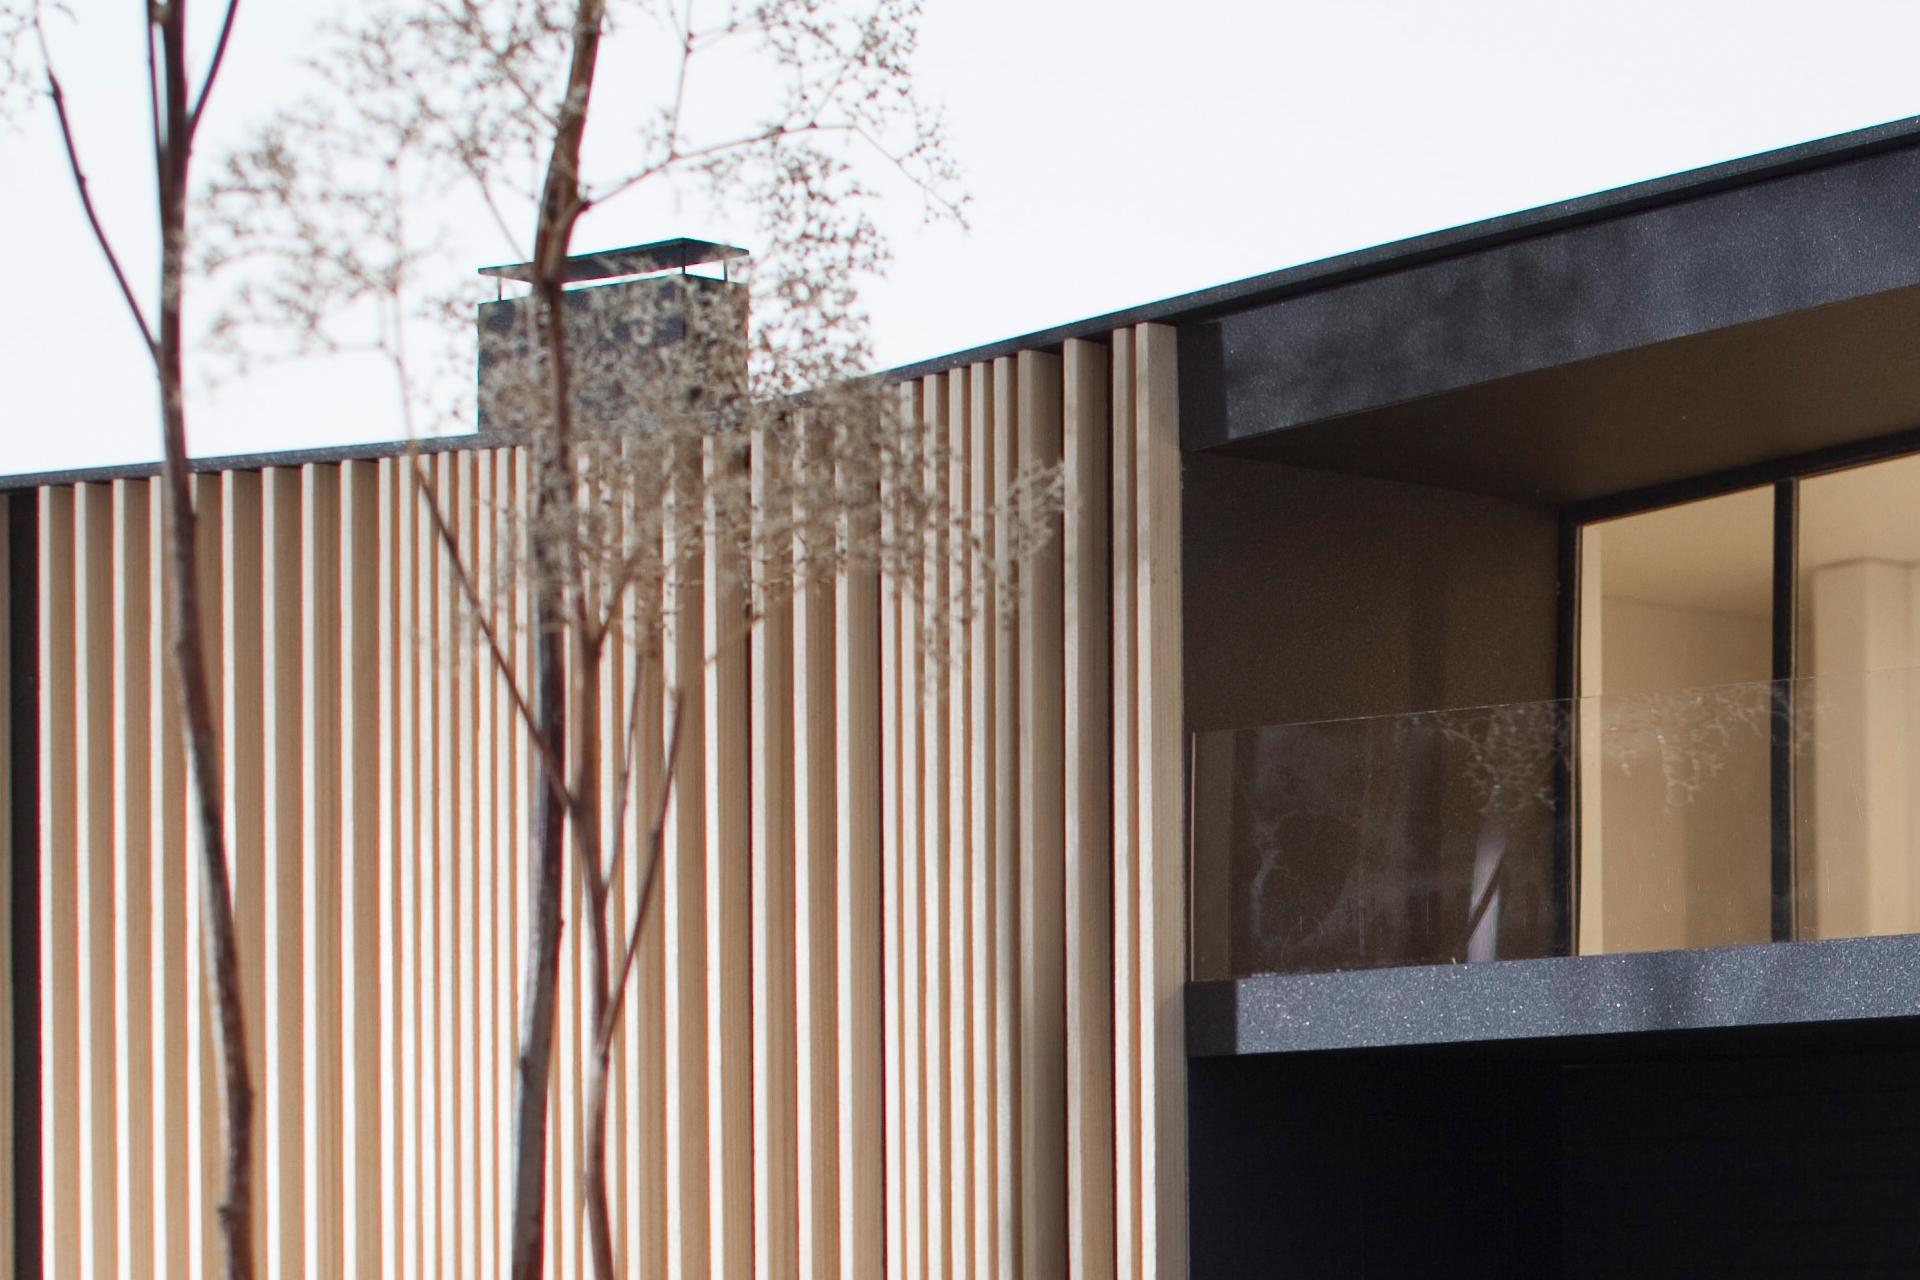 onimo-makiety-architektoniczne-PAG-shutter-08